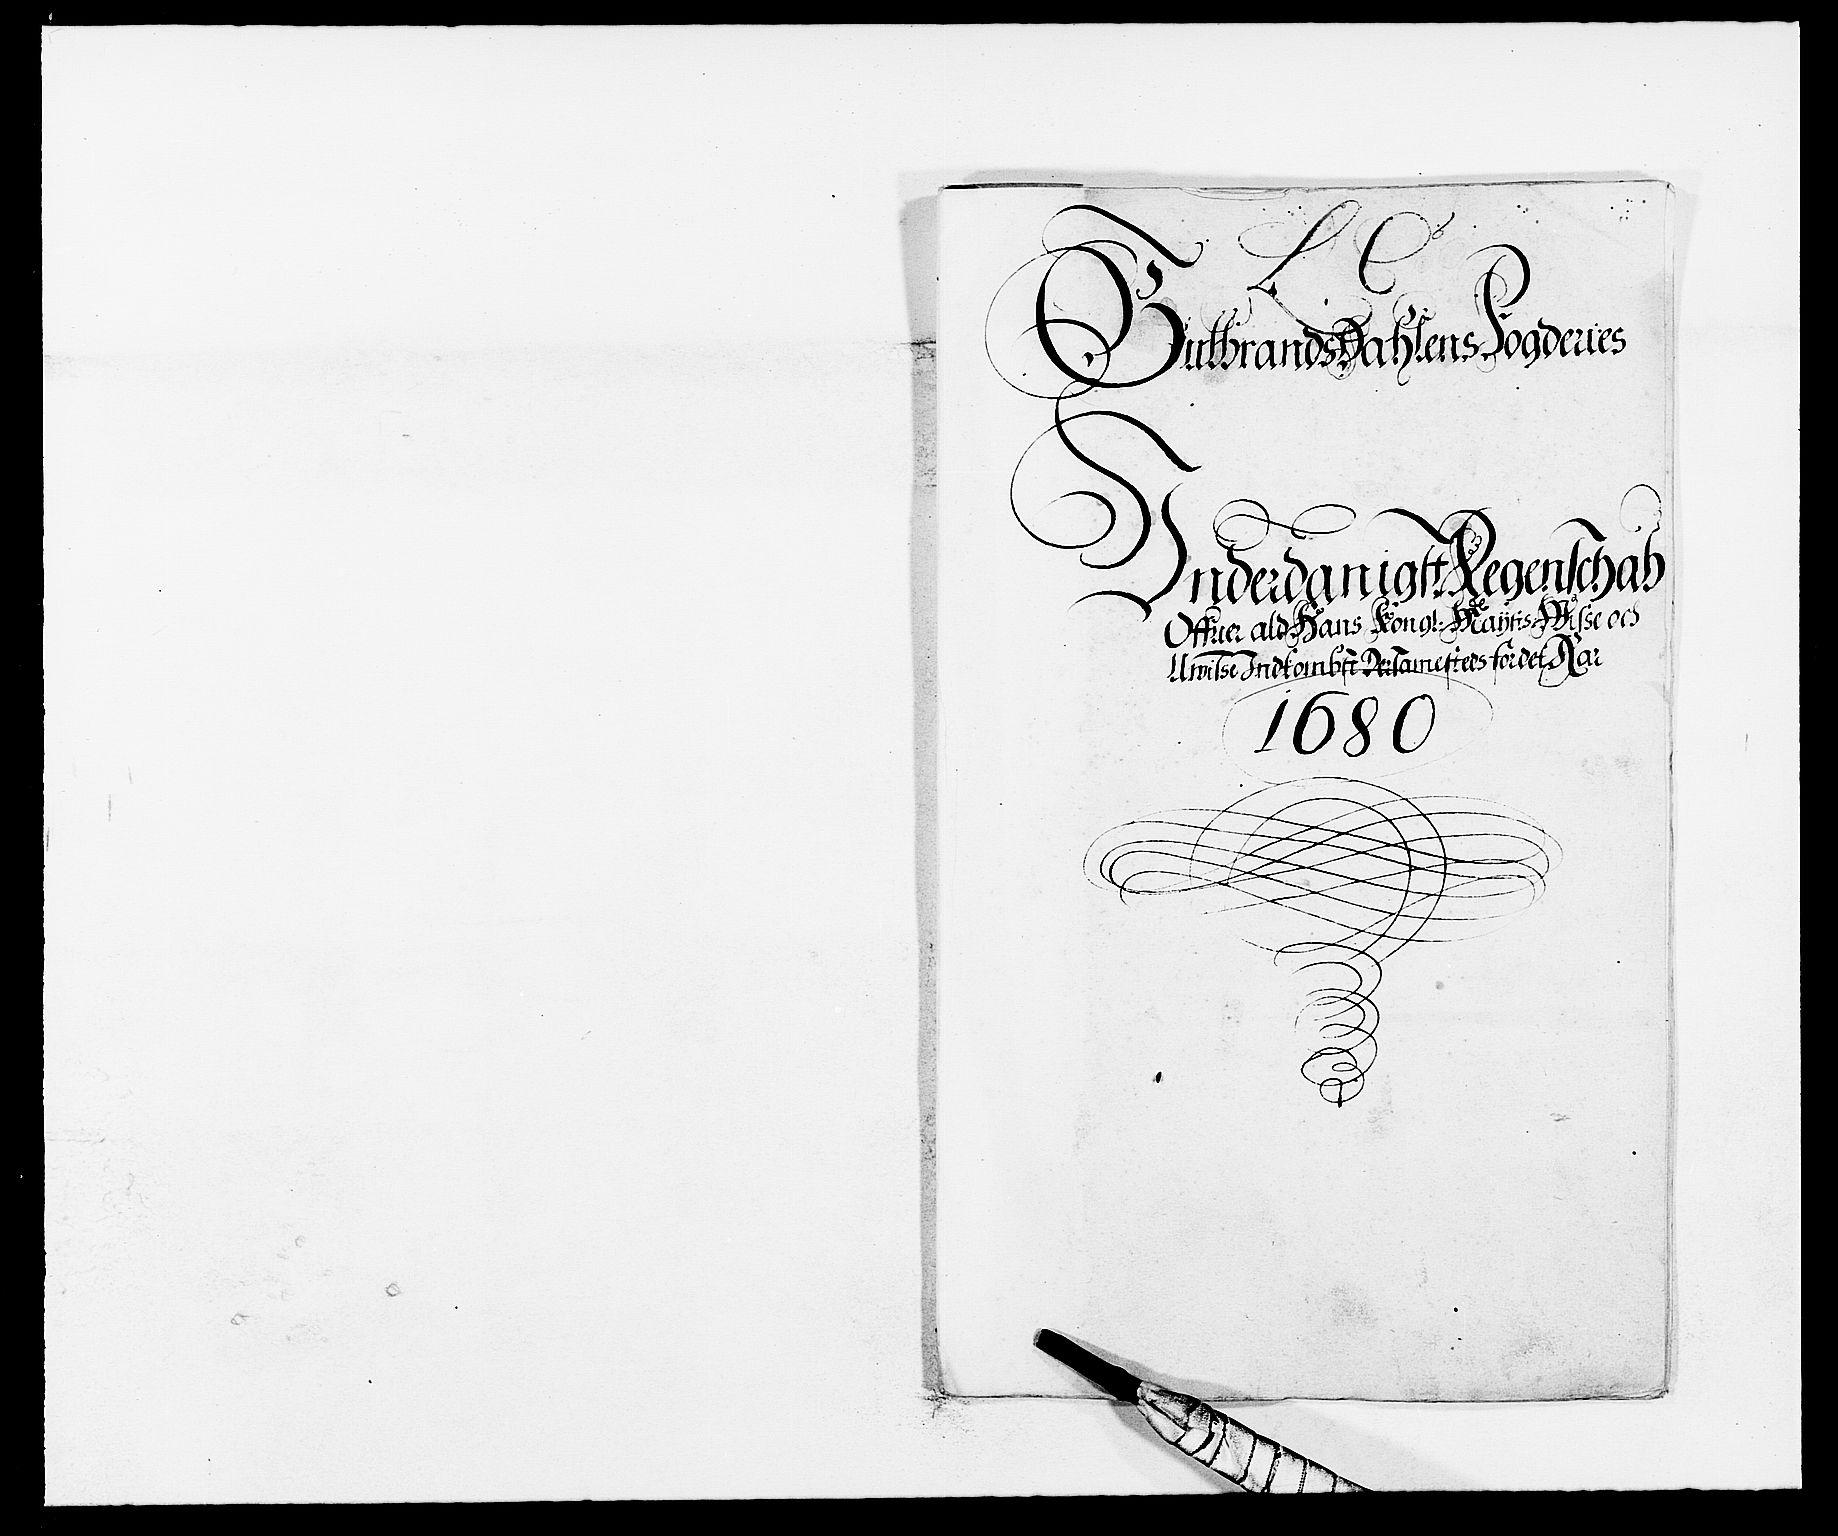 RA, Rentekammeret inntil 1814, Reviderte regnskaper, Fogderegnskap, R17/L1154: Fogderegnskap Gudbrandsdal, 1680, s. 2